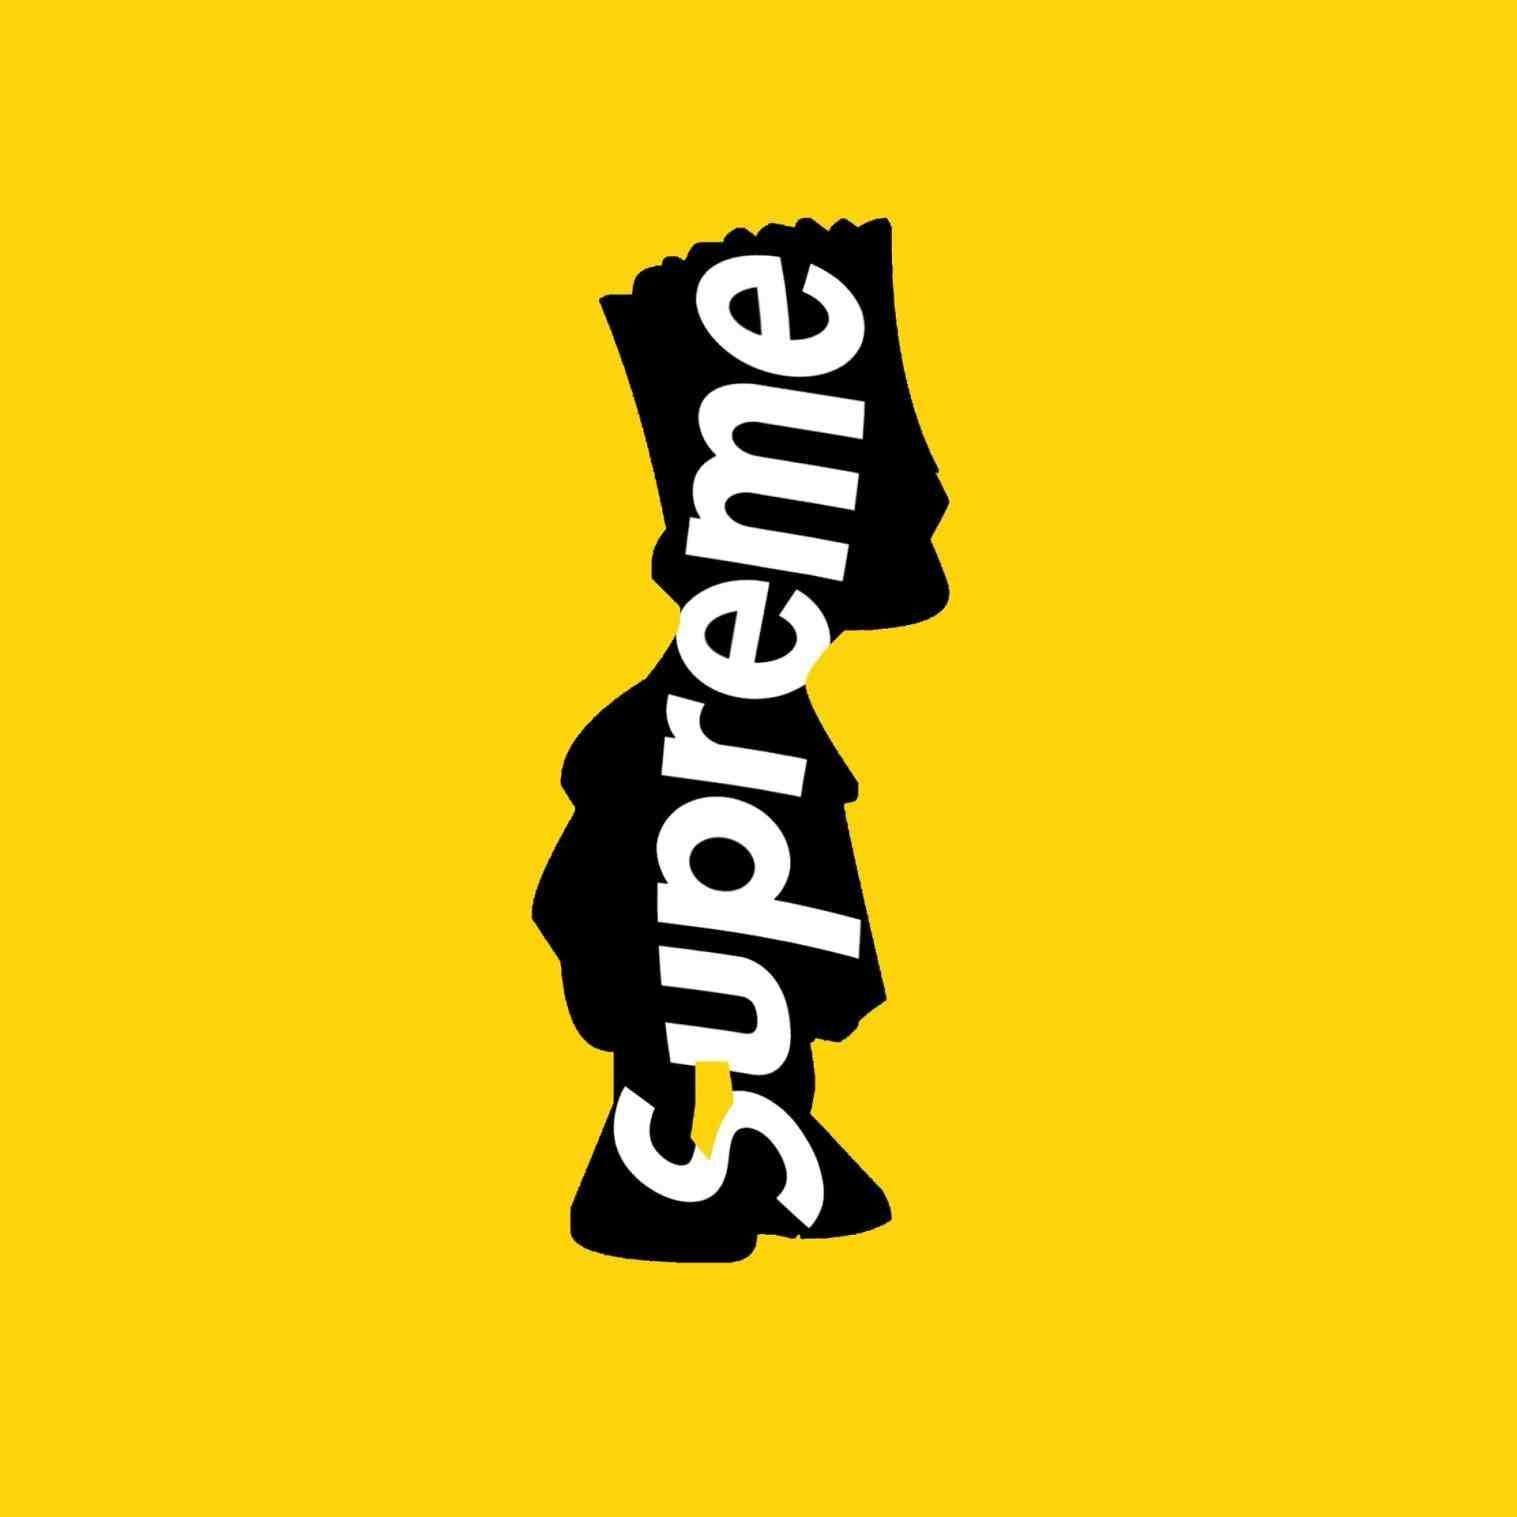 2 Bart Simpson Supreme Wallpapers Top Free 2 Bart Simpson Supreme